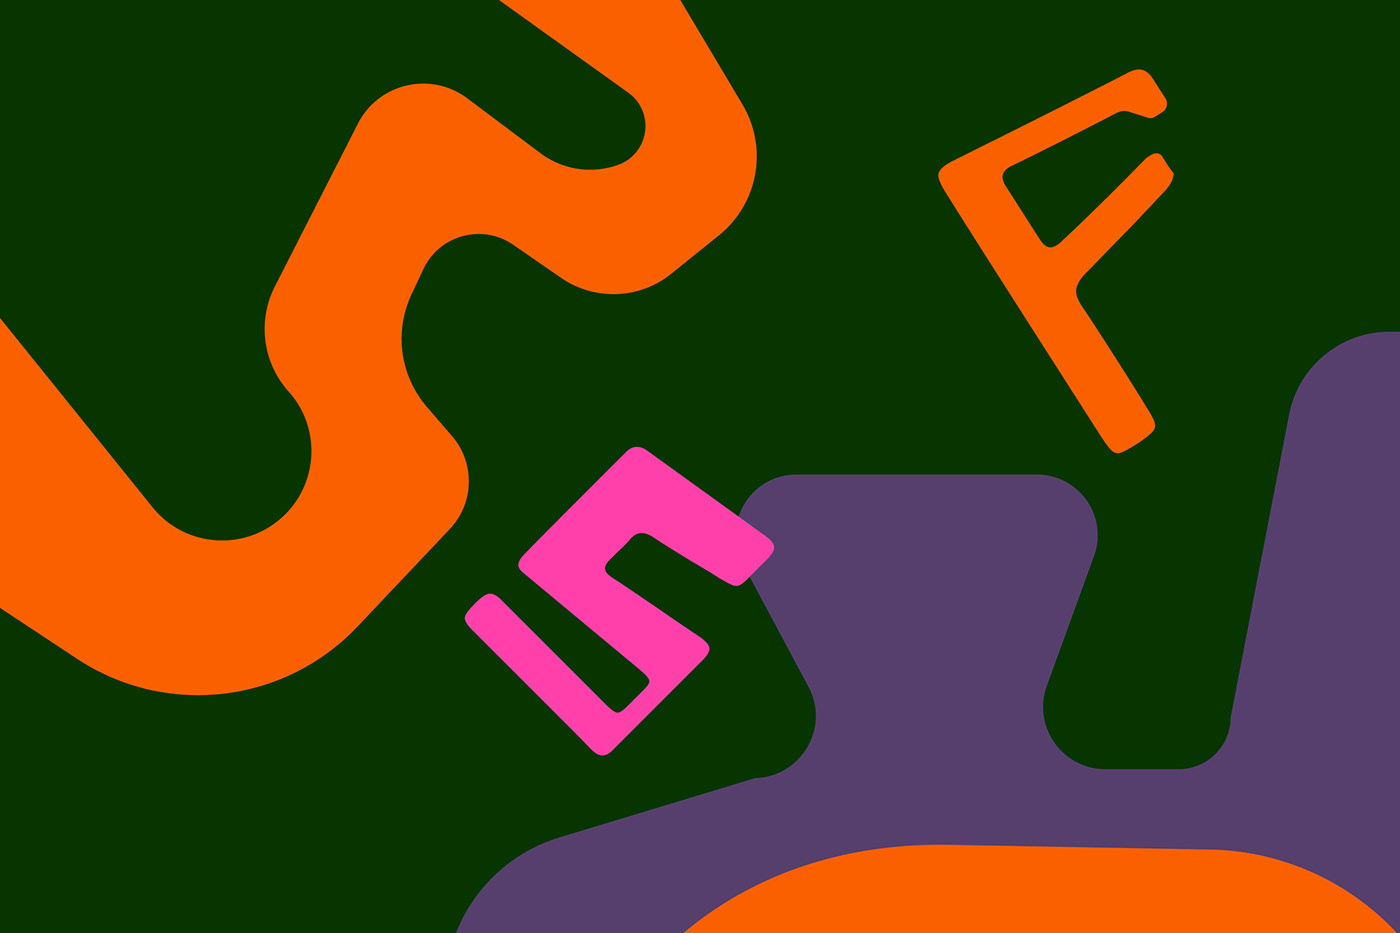 typeface sans serif Free font burle marx font download font type modernism Brazil